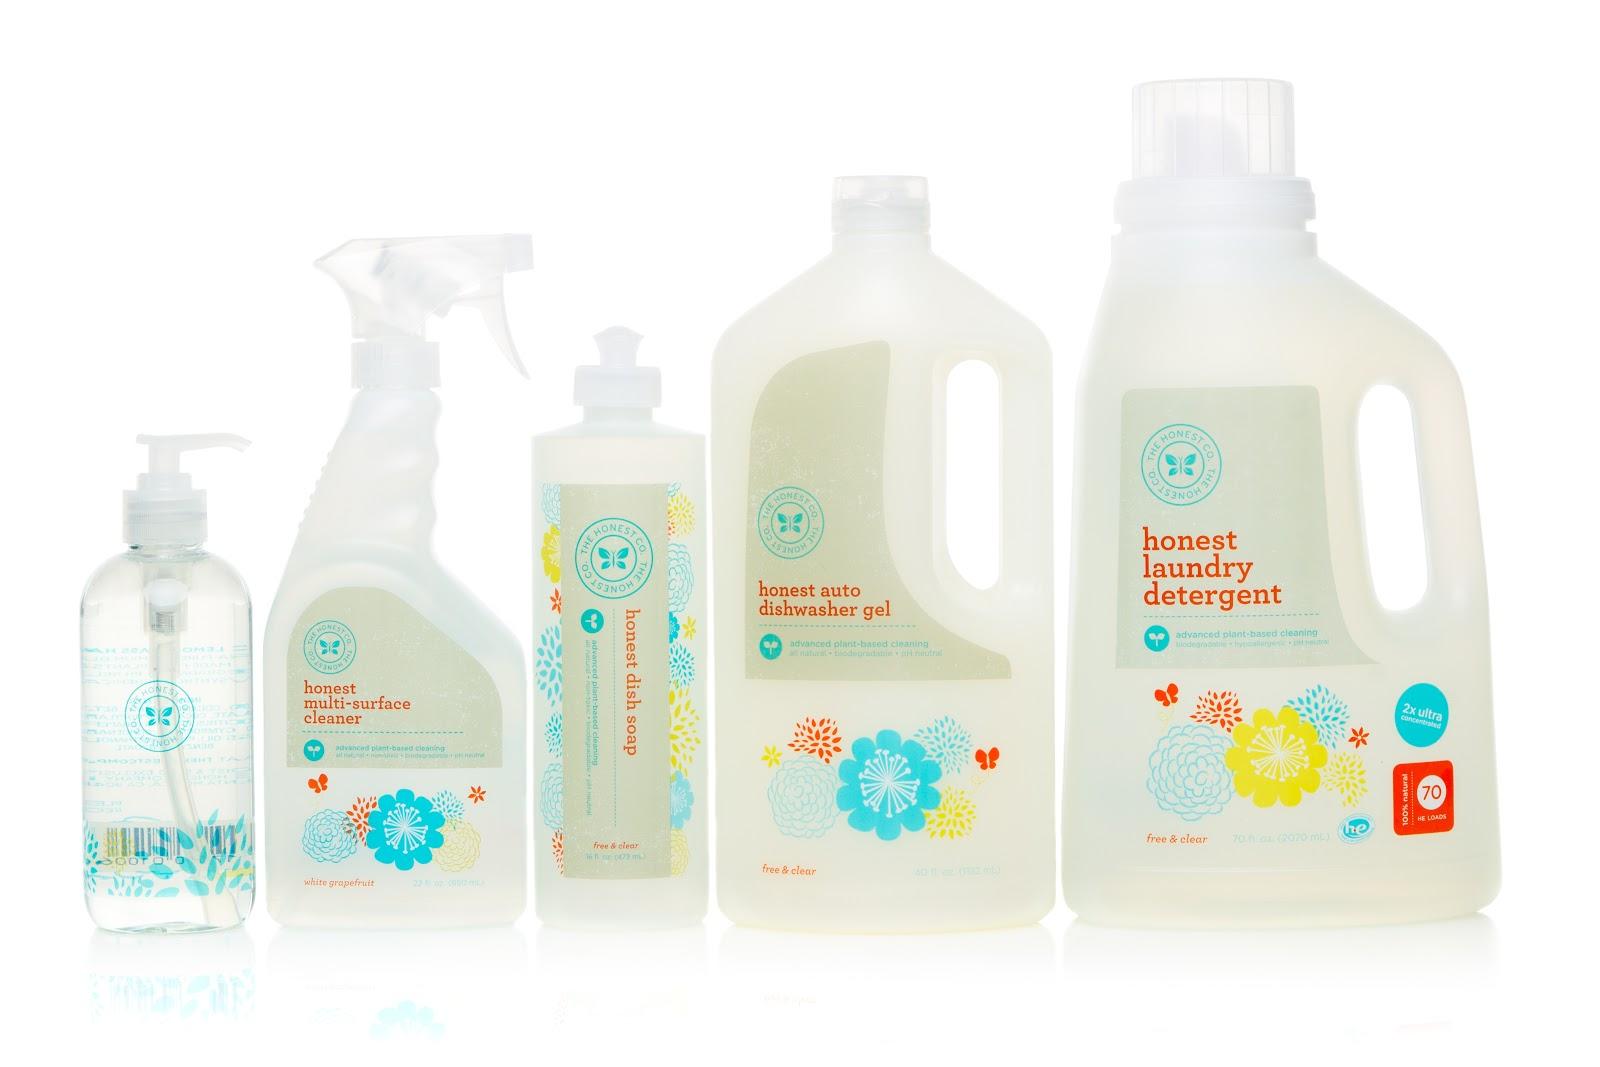 Choose Children's Fun Bath Products